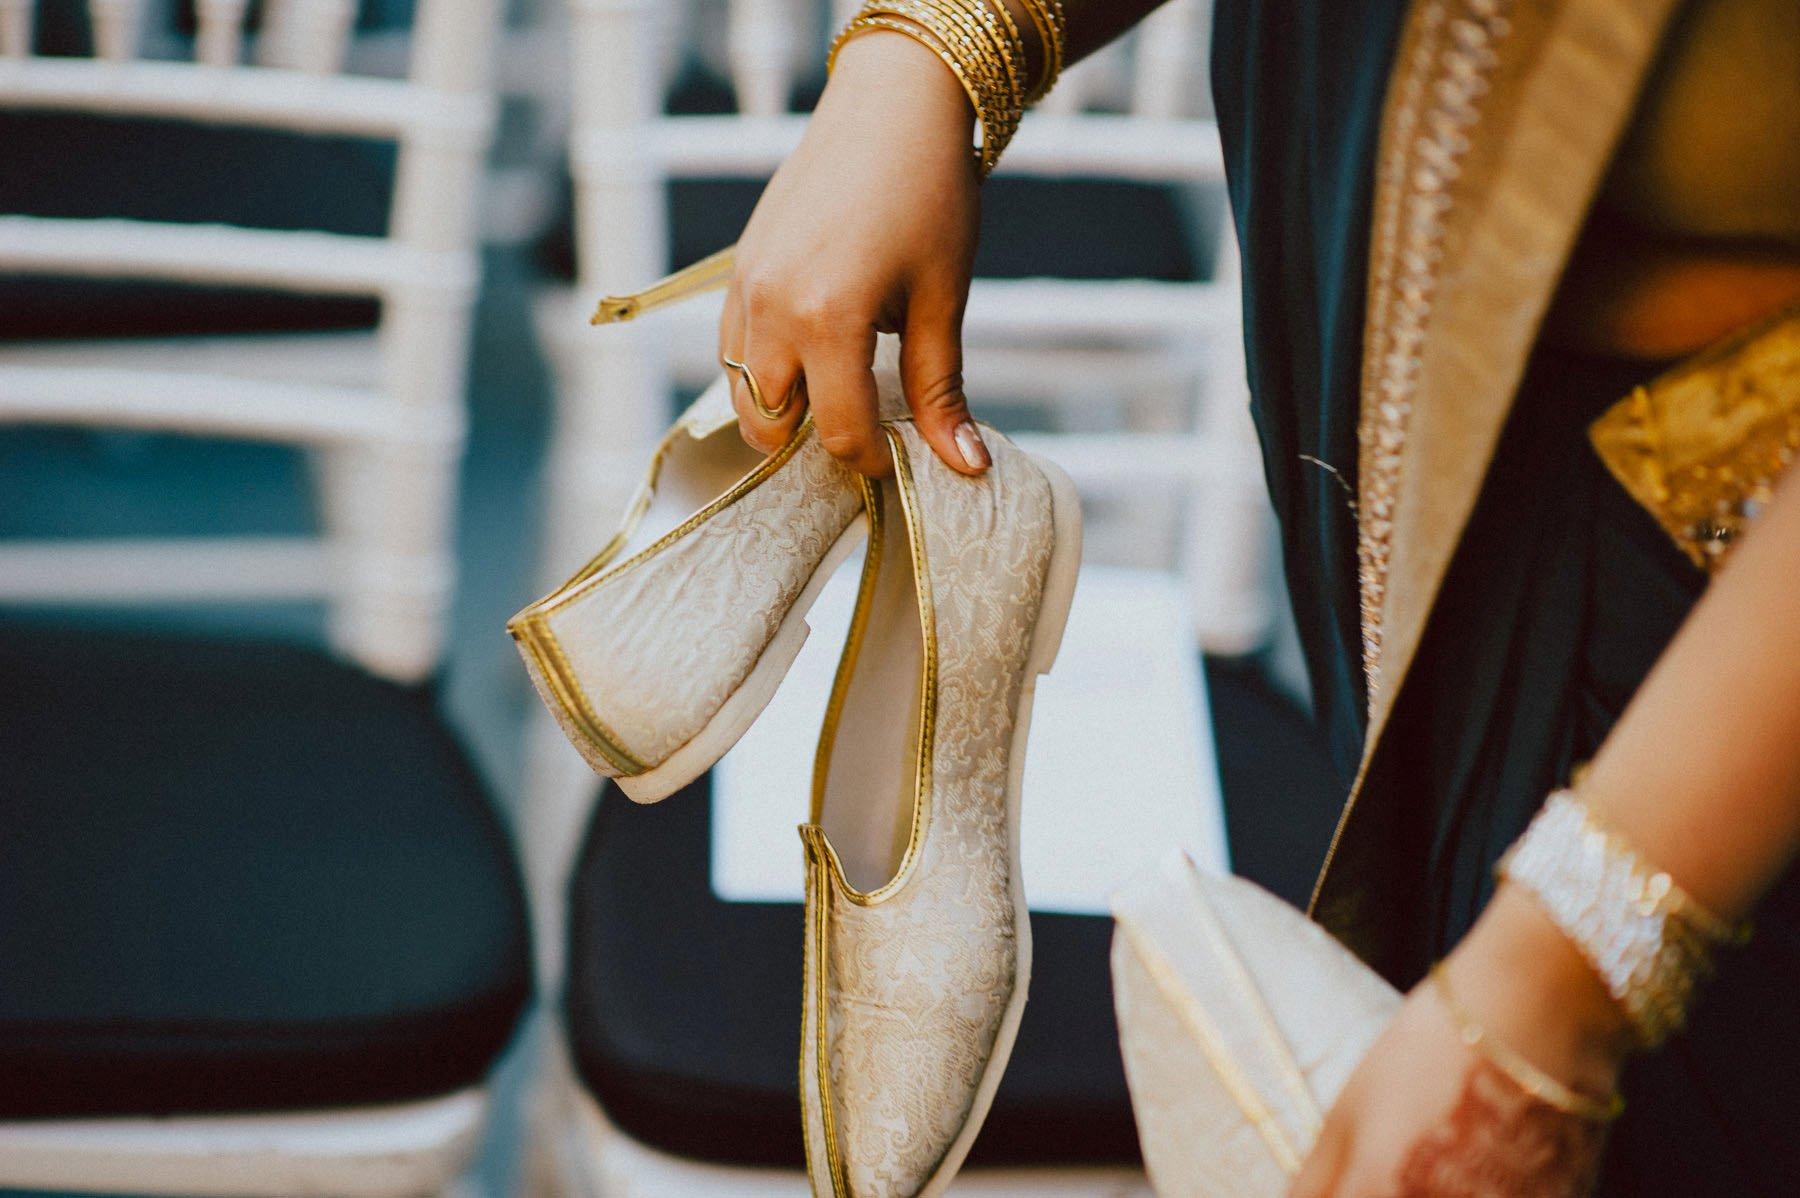 vie-philadelphia-indian-wedding-86.jpg